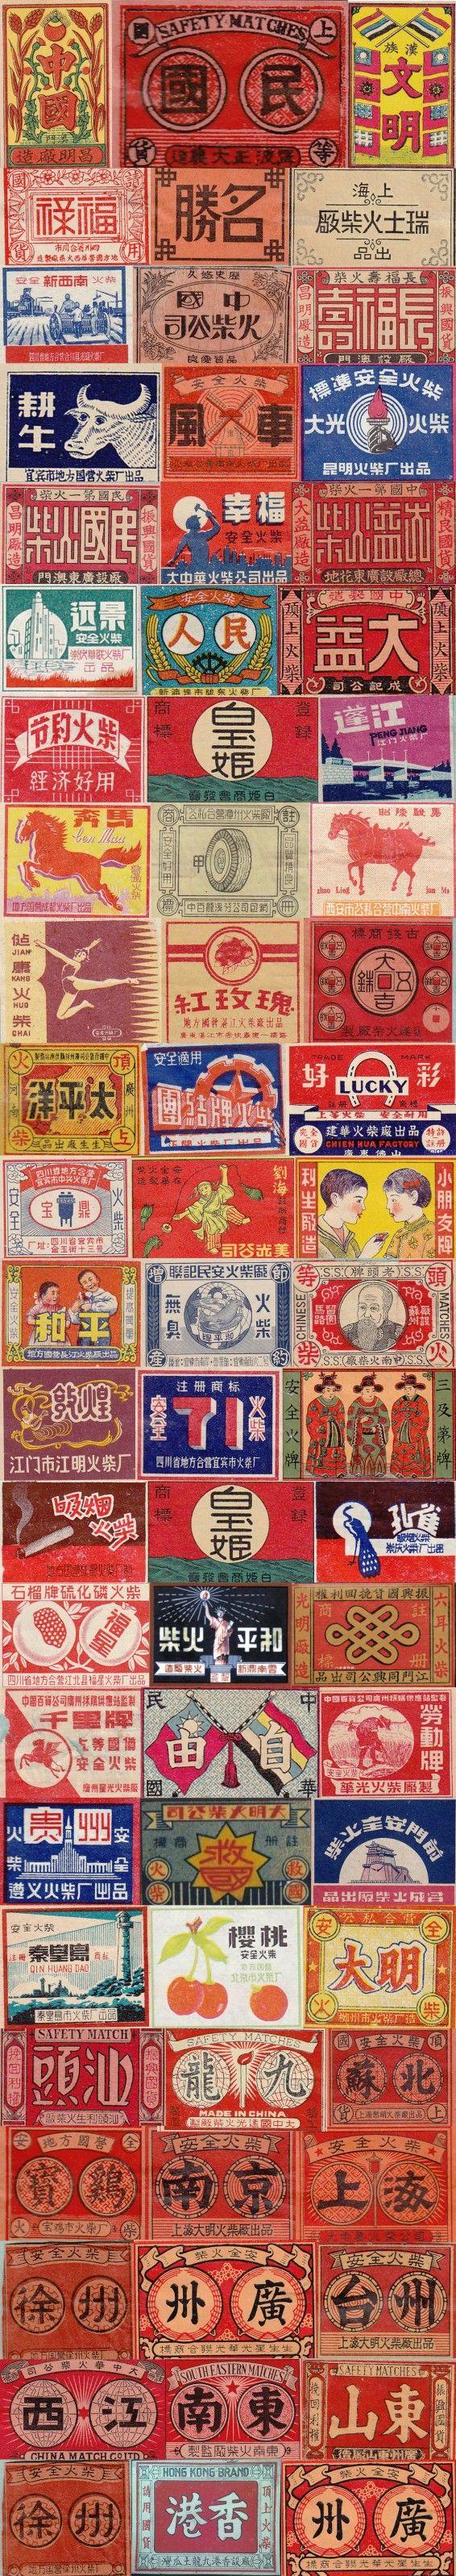 Asian match boxes